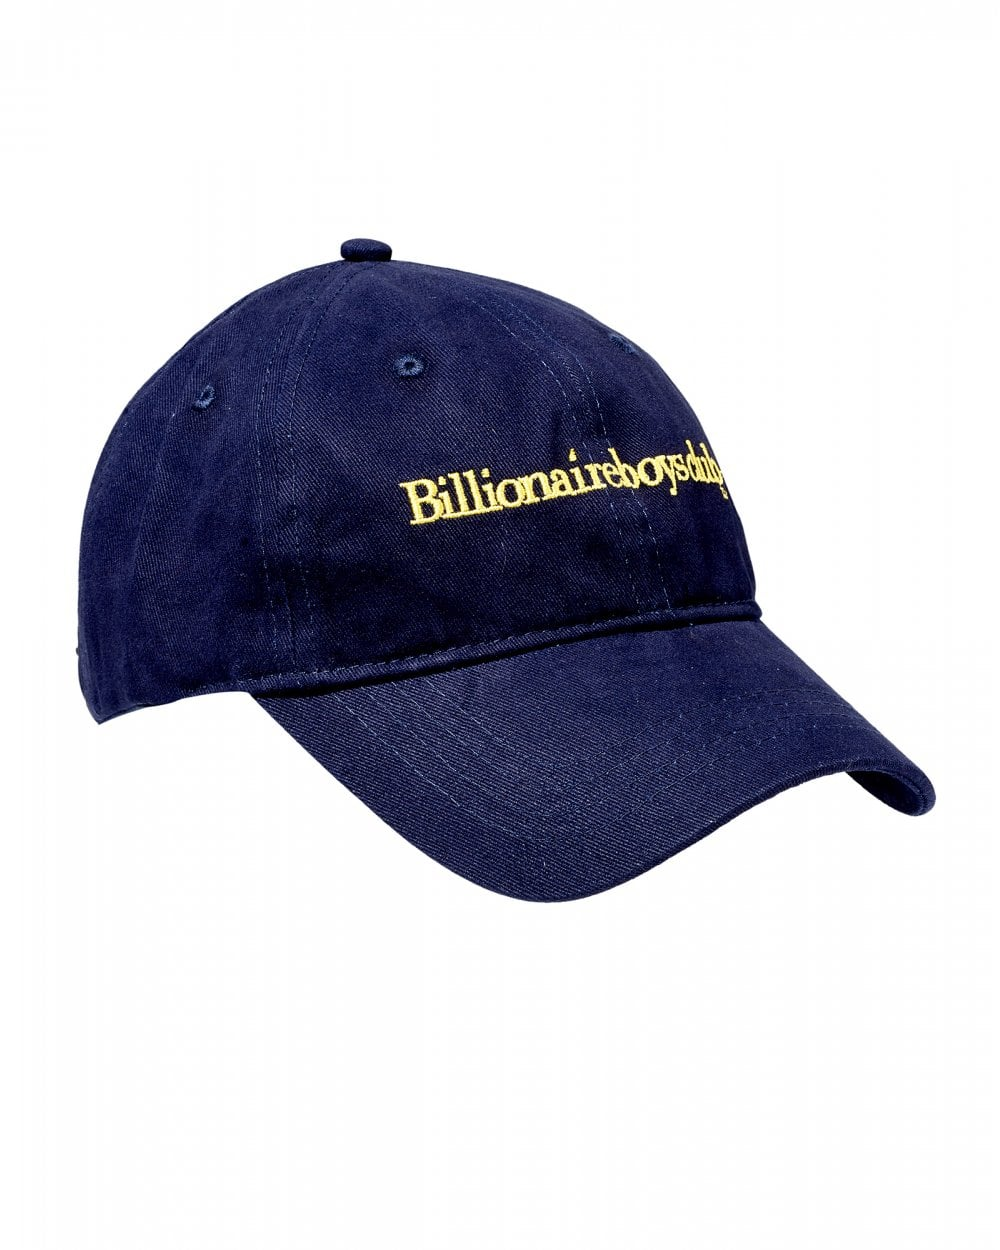 Billionaire Boys Club Mens Embroidered Text Logo Cap 8cf046c5e40